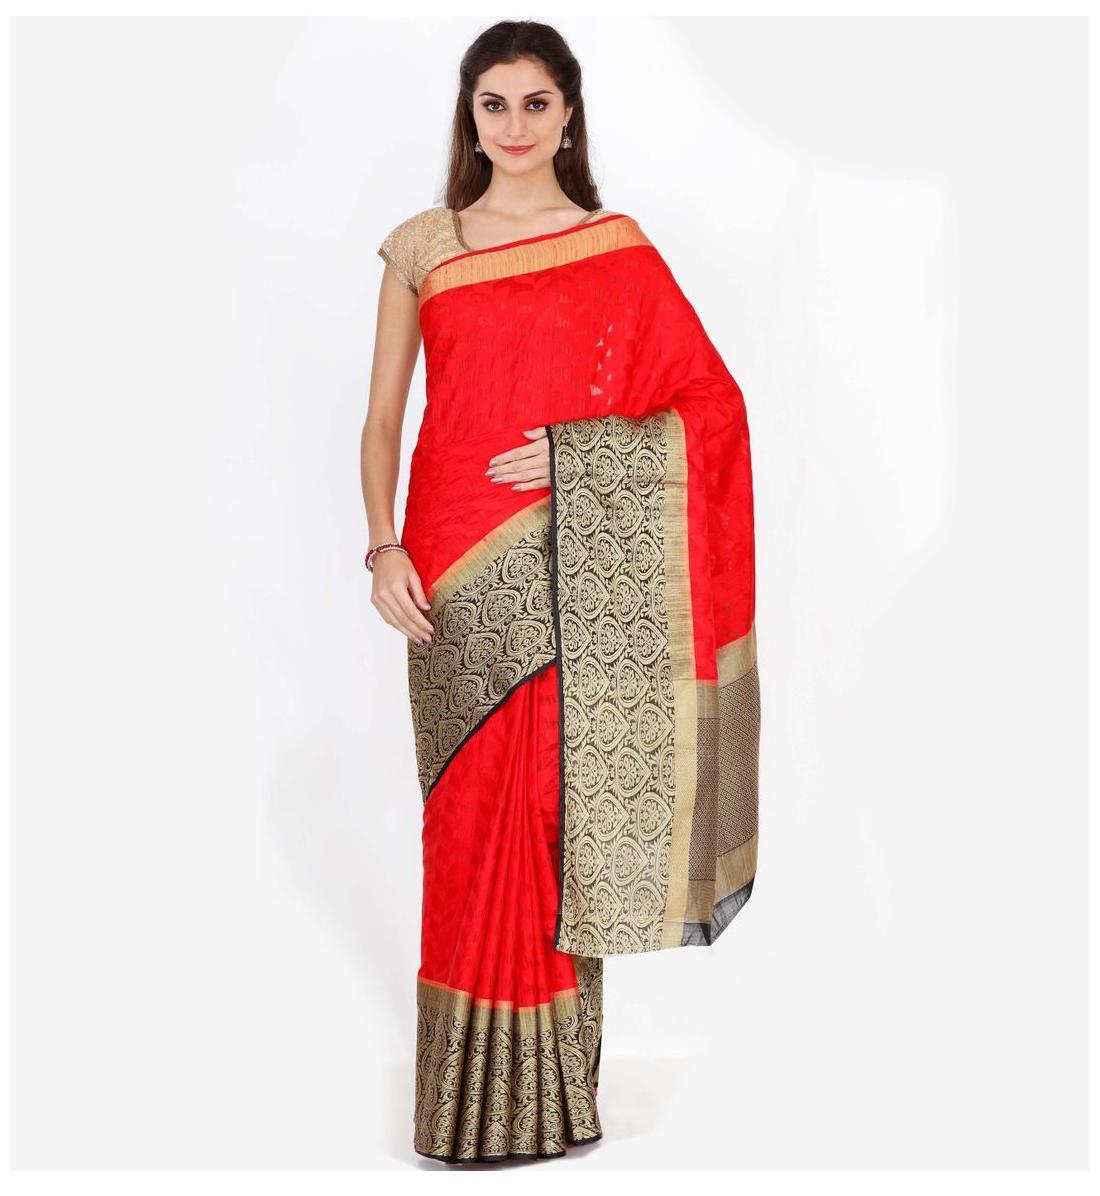 Other Women's Clothing Clothing, Shoes & Accessories Hot Sale Banarasi Lehenga Choli Wedding Bridal Brocade Lengha Sari Party Wear Indian Girl Convenience Goods